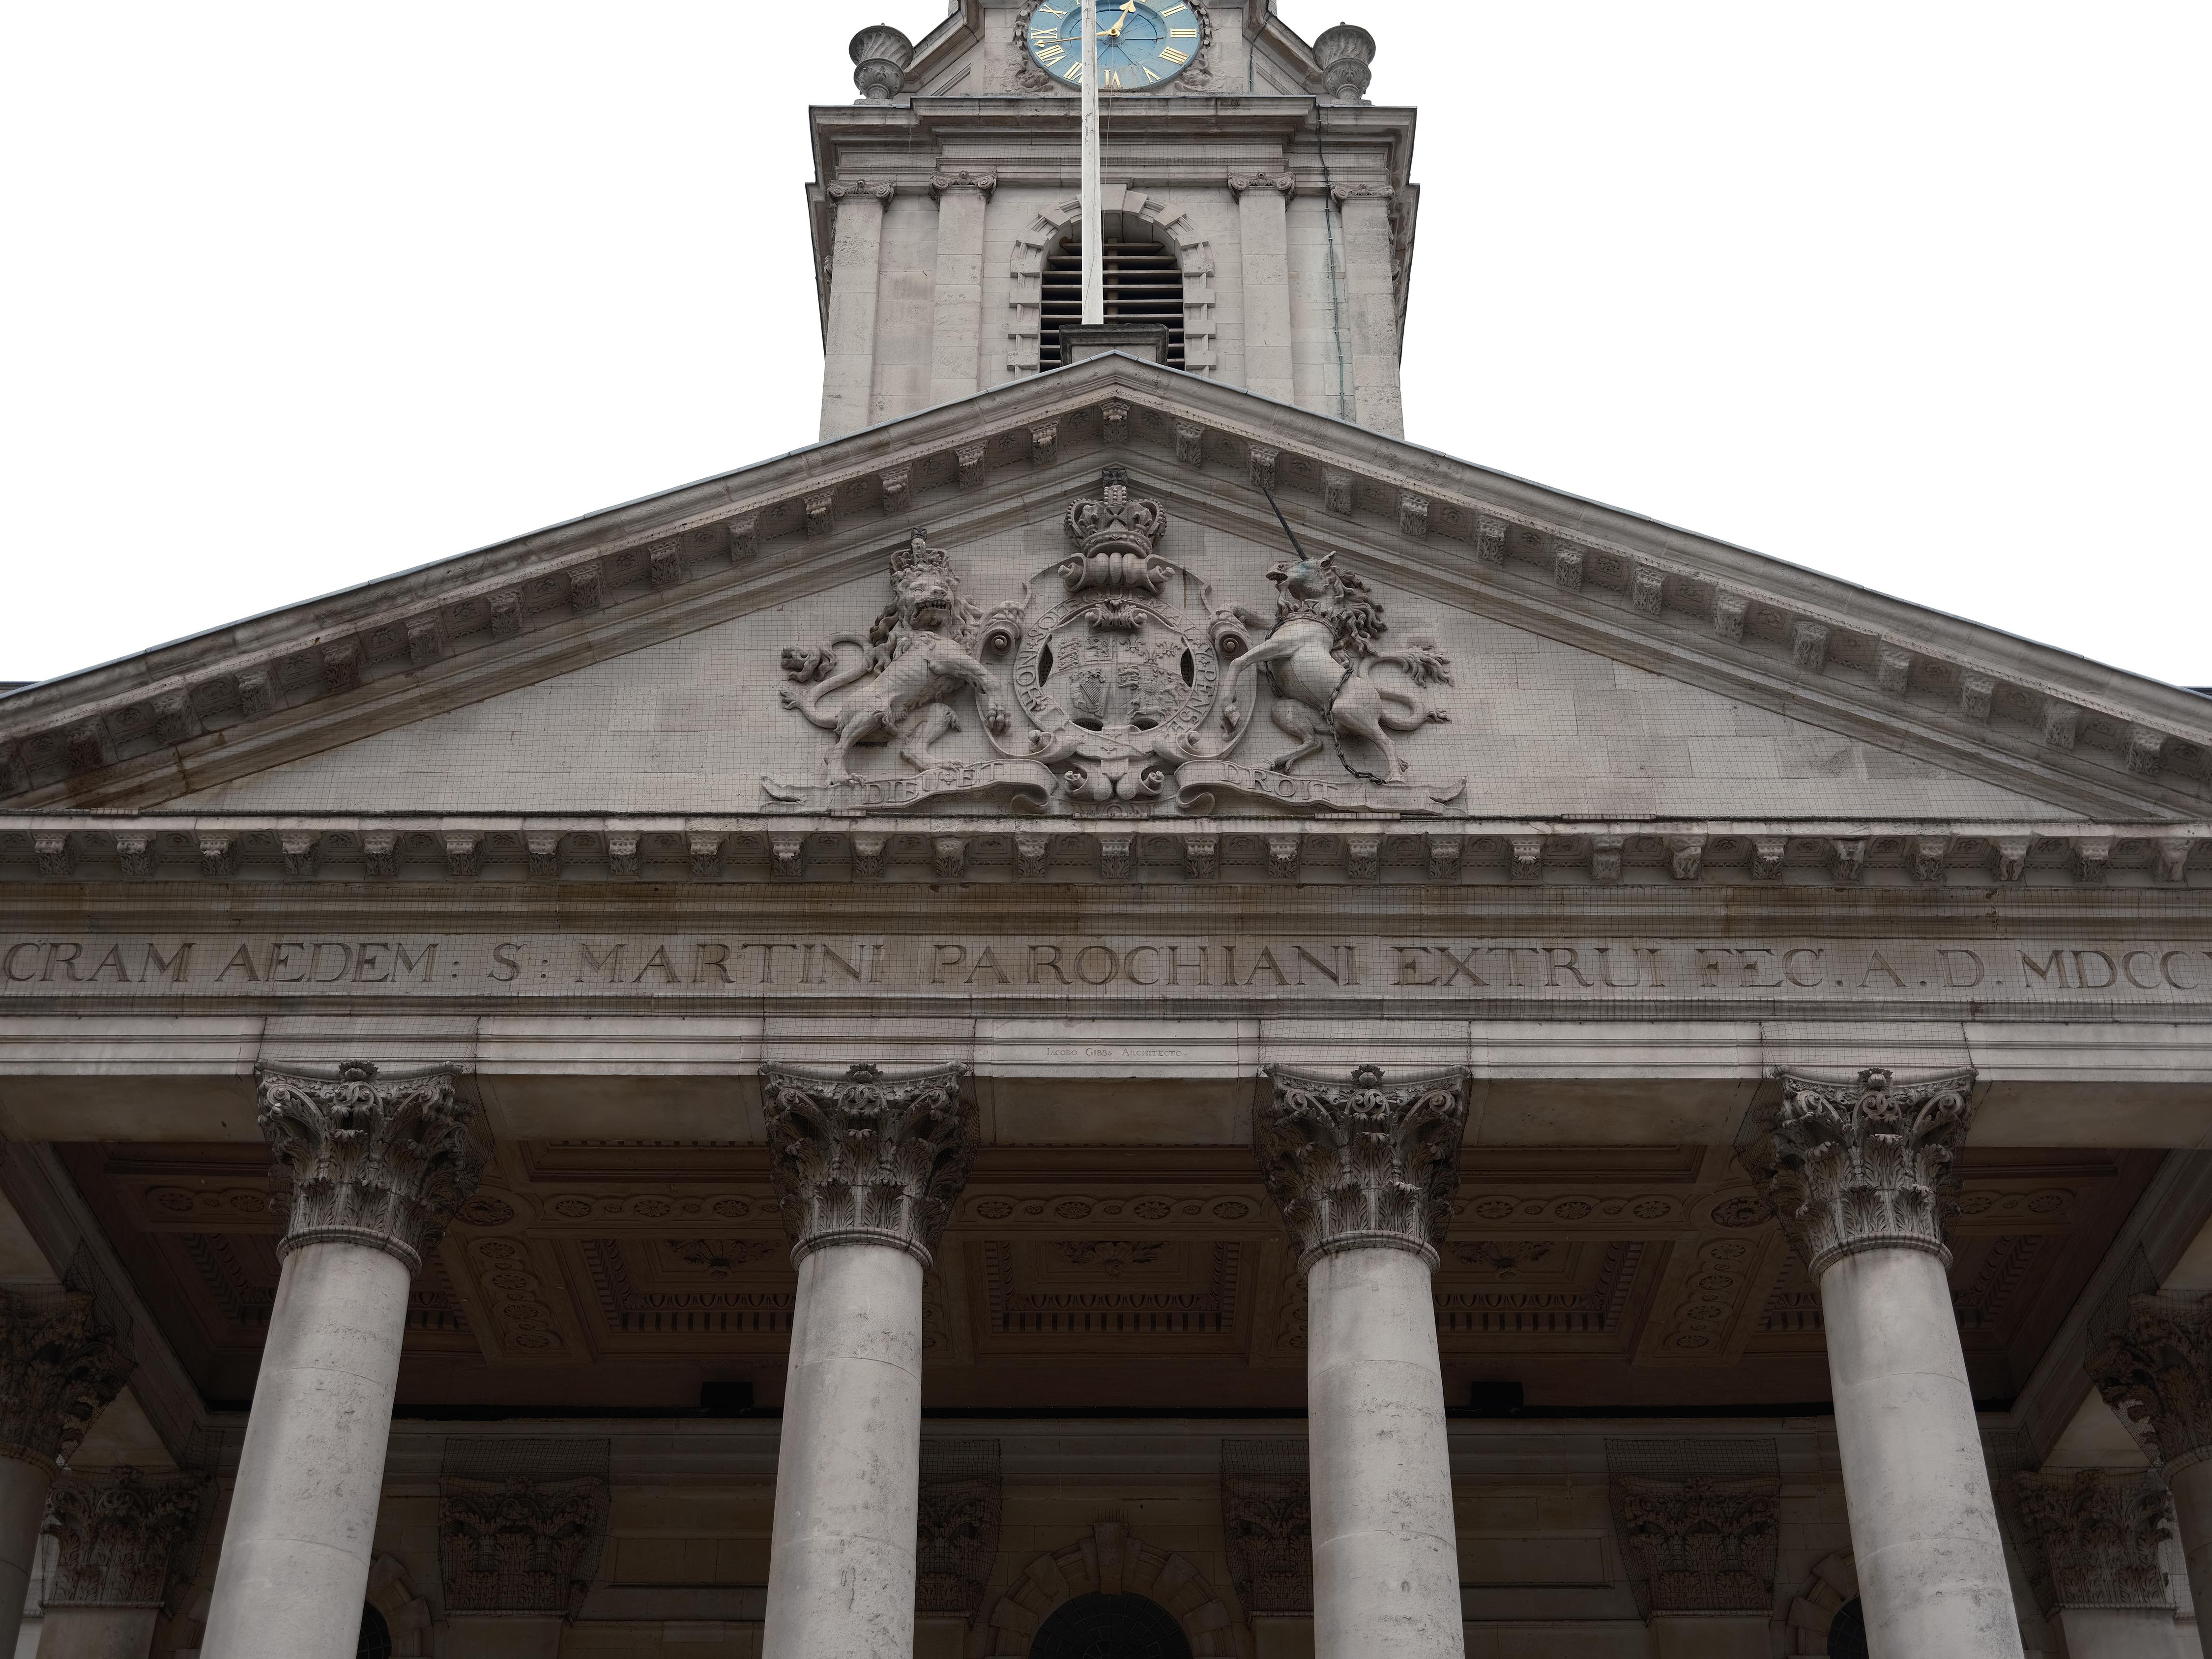 A building in London's Trafalgar Square